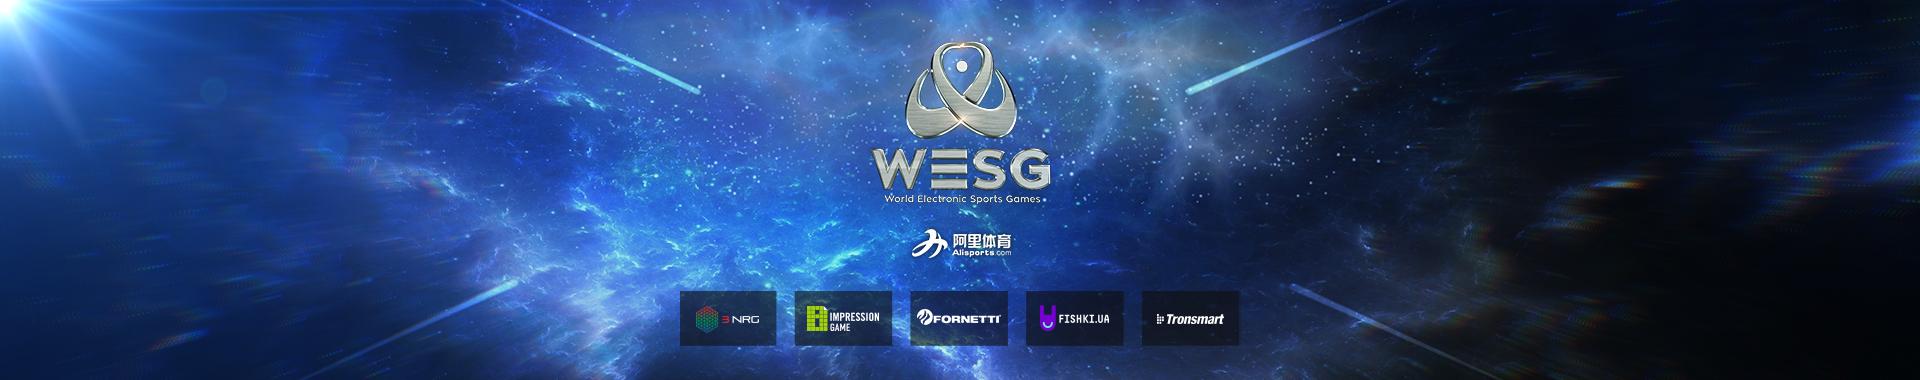 WESG Ukraine 2018-2019 StarCraft II